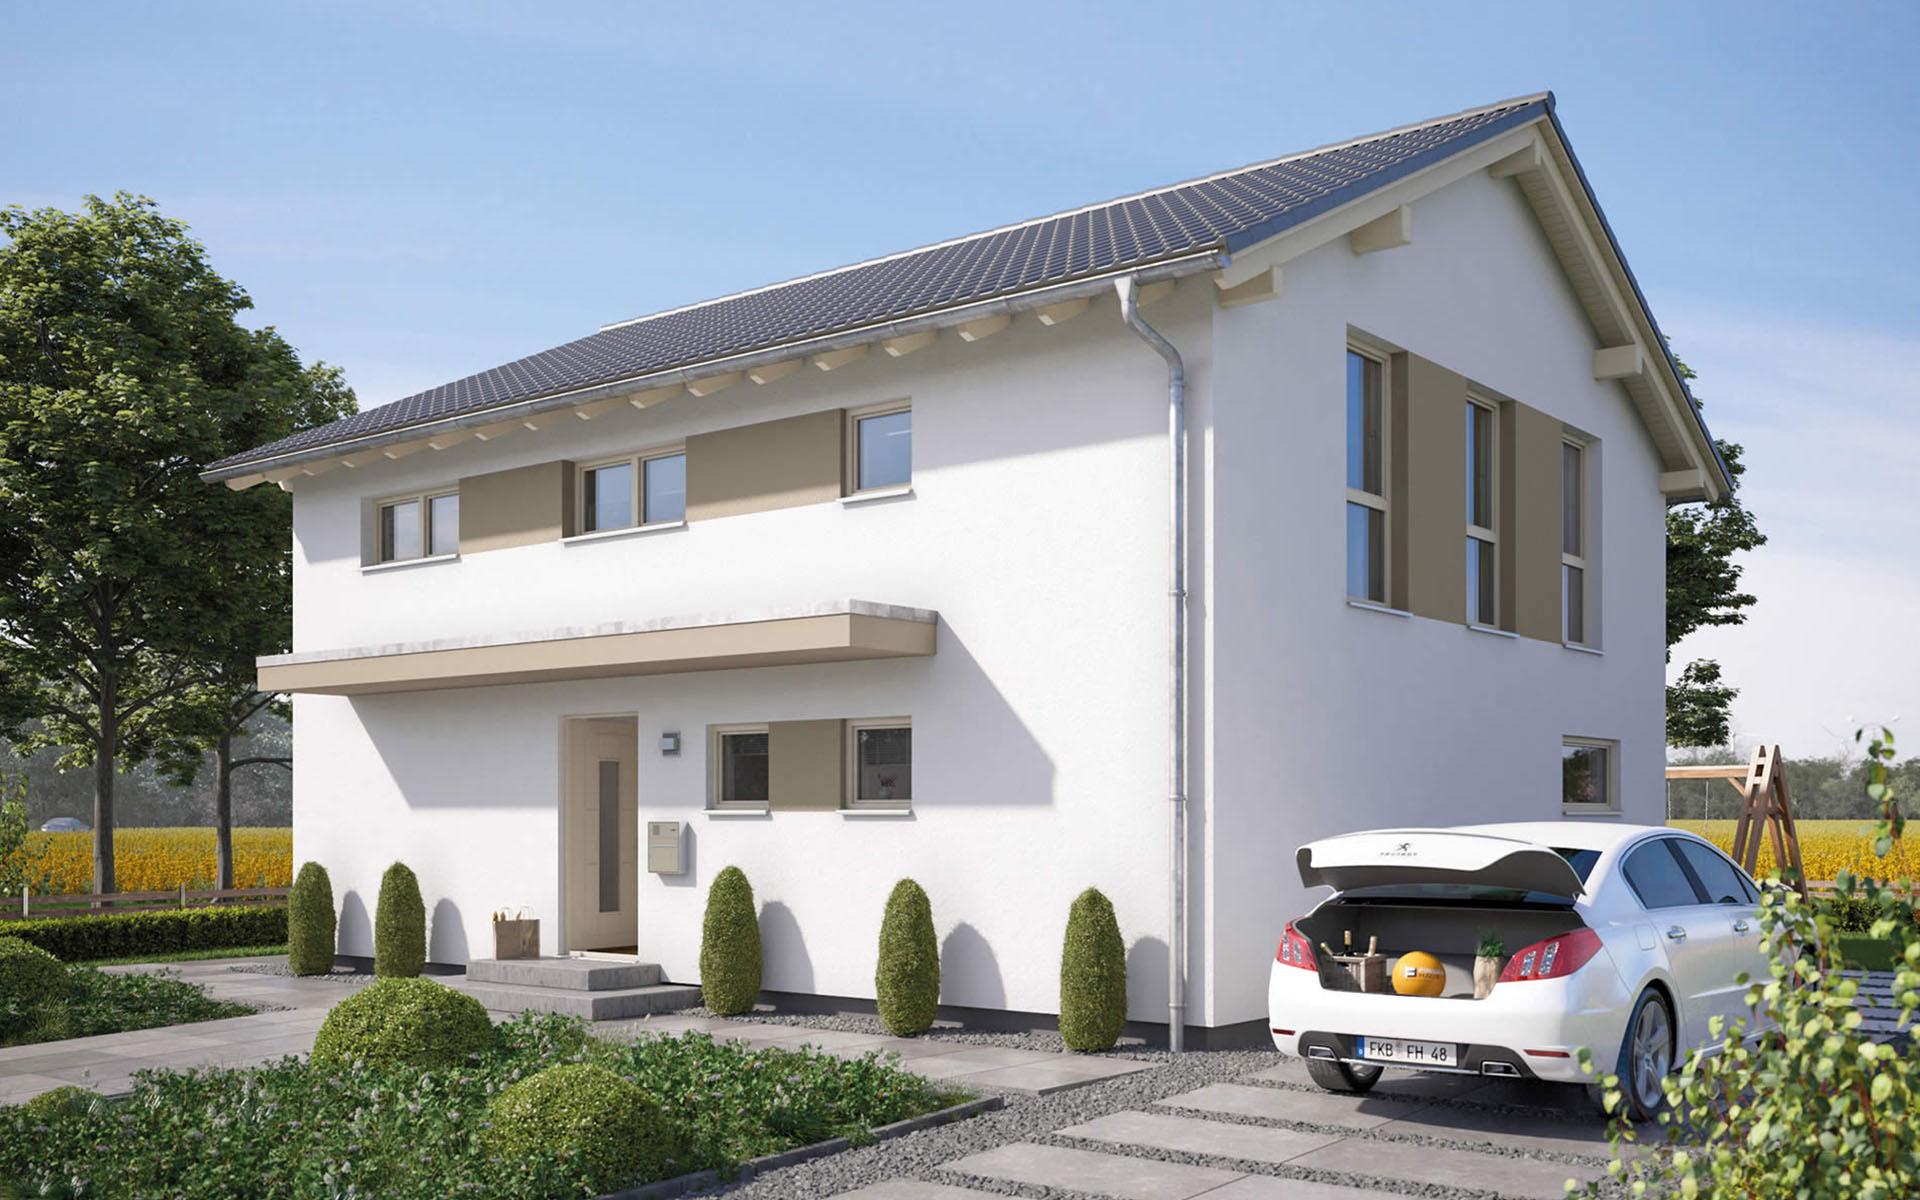 SENTO 504 K S130 von FingerHaus GmbH